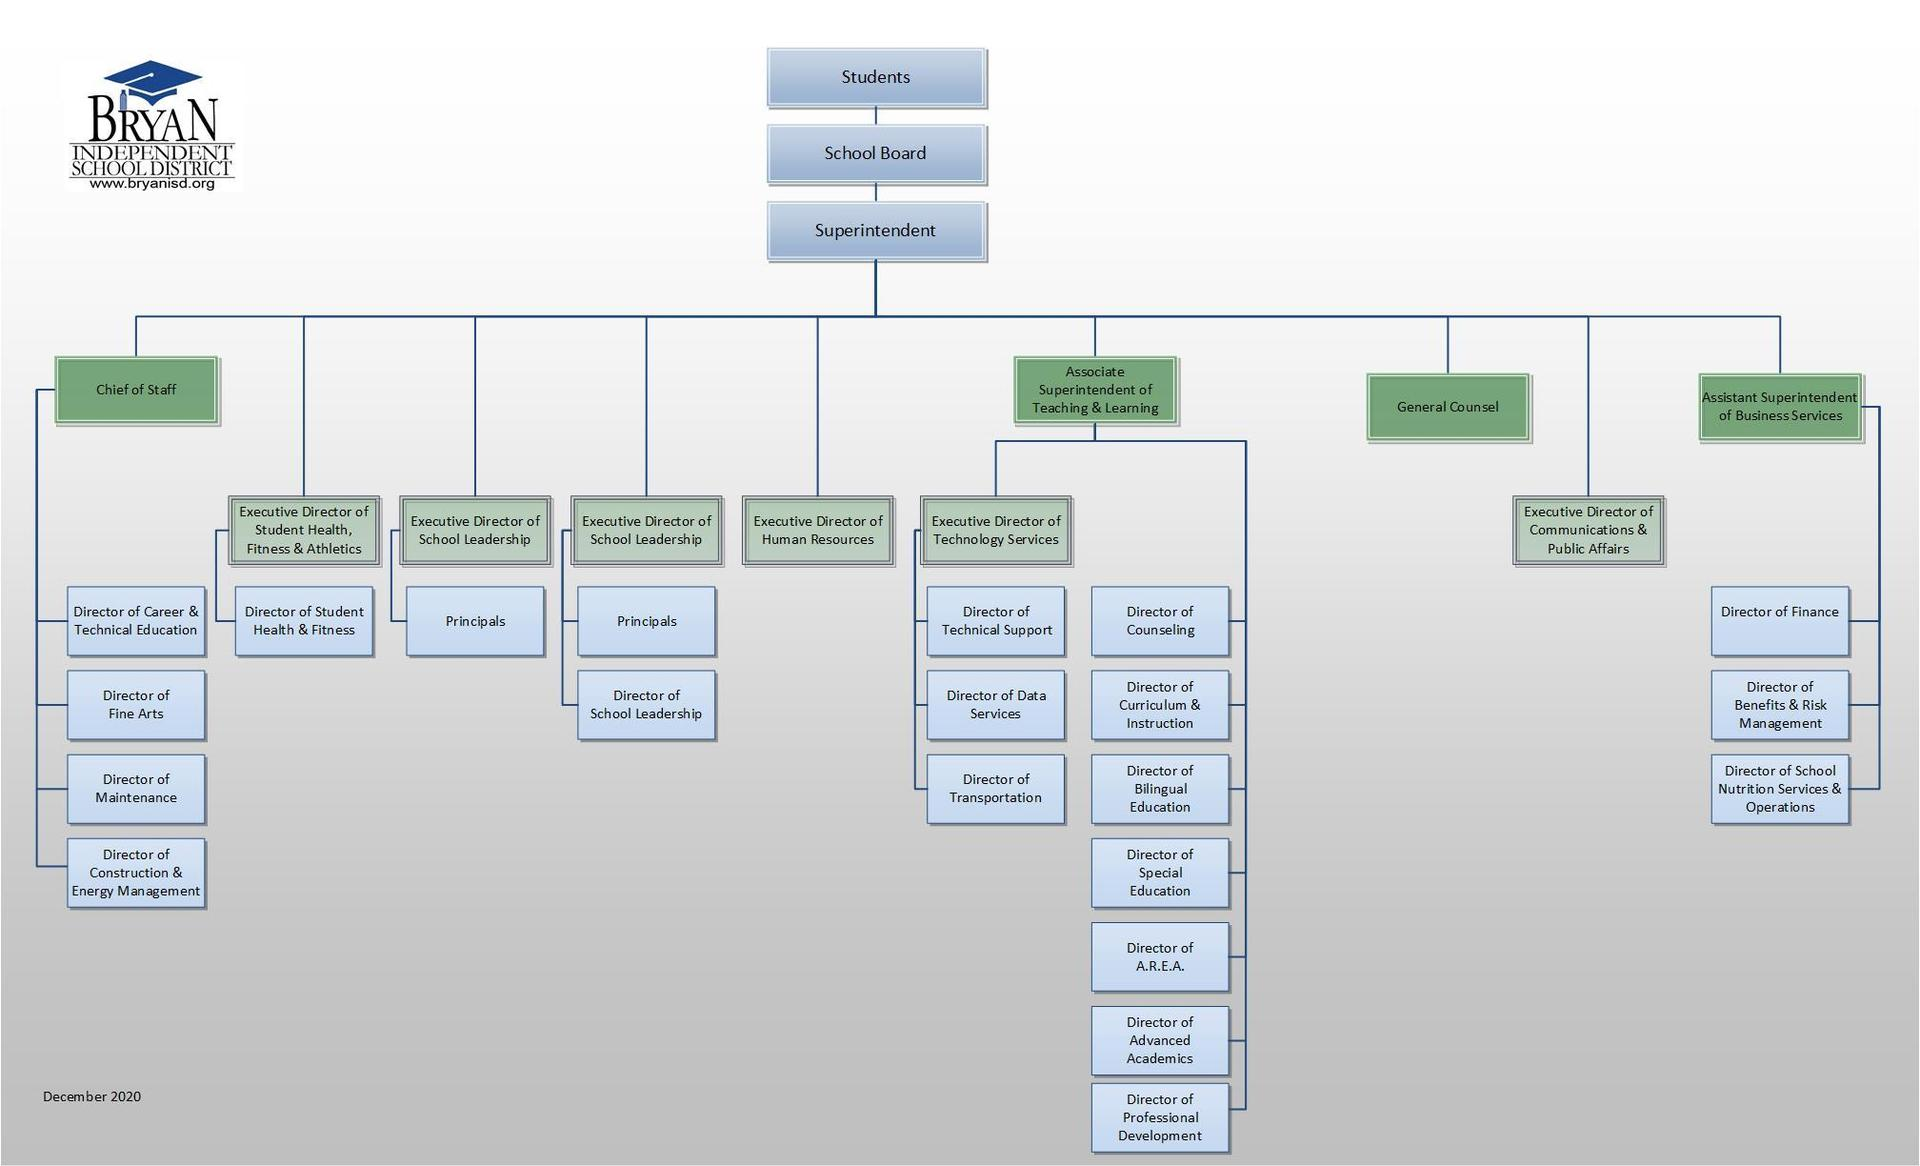 Bryan ISD Organization Chart